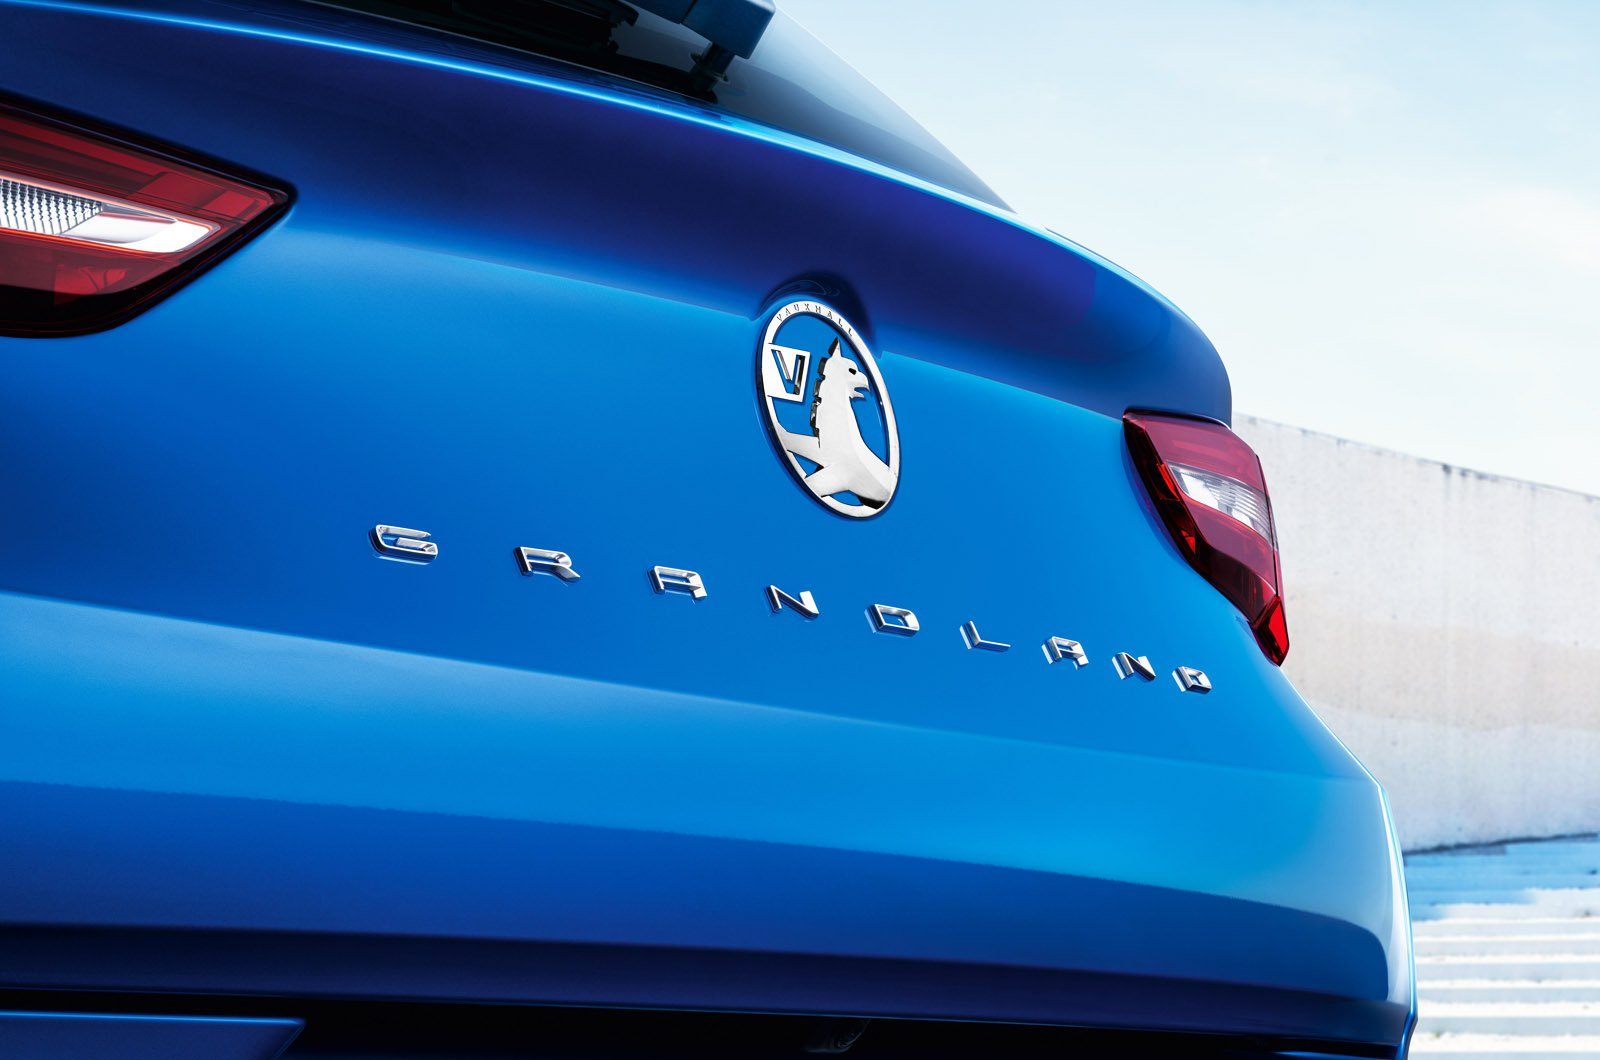 Vauxhall Grandland 2021 rear